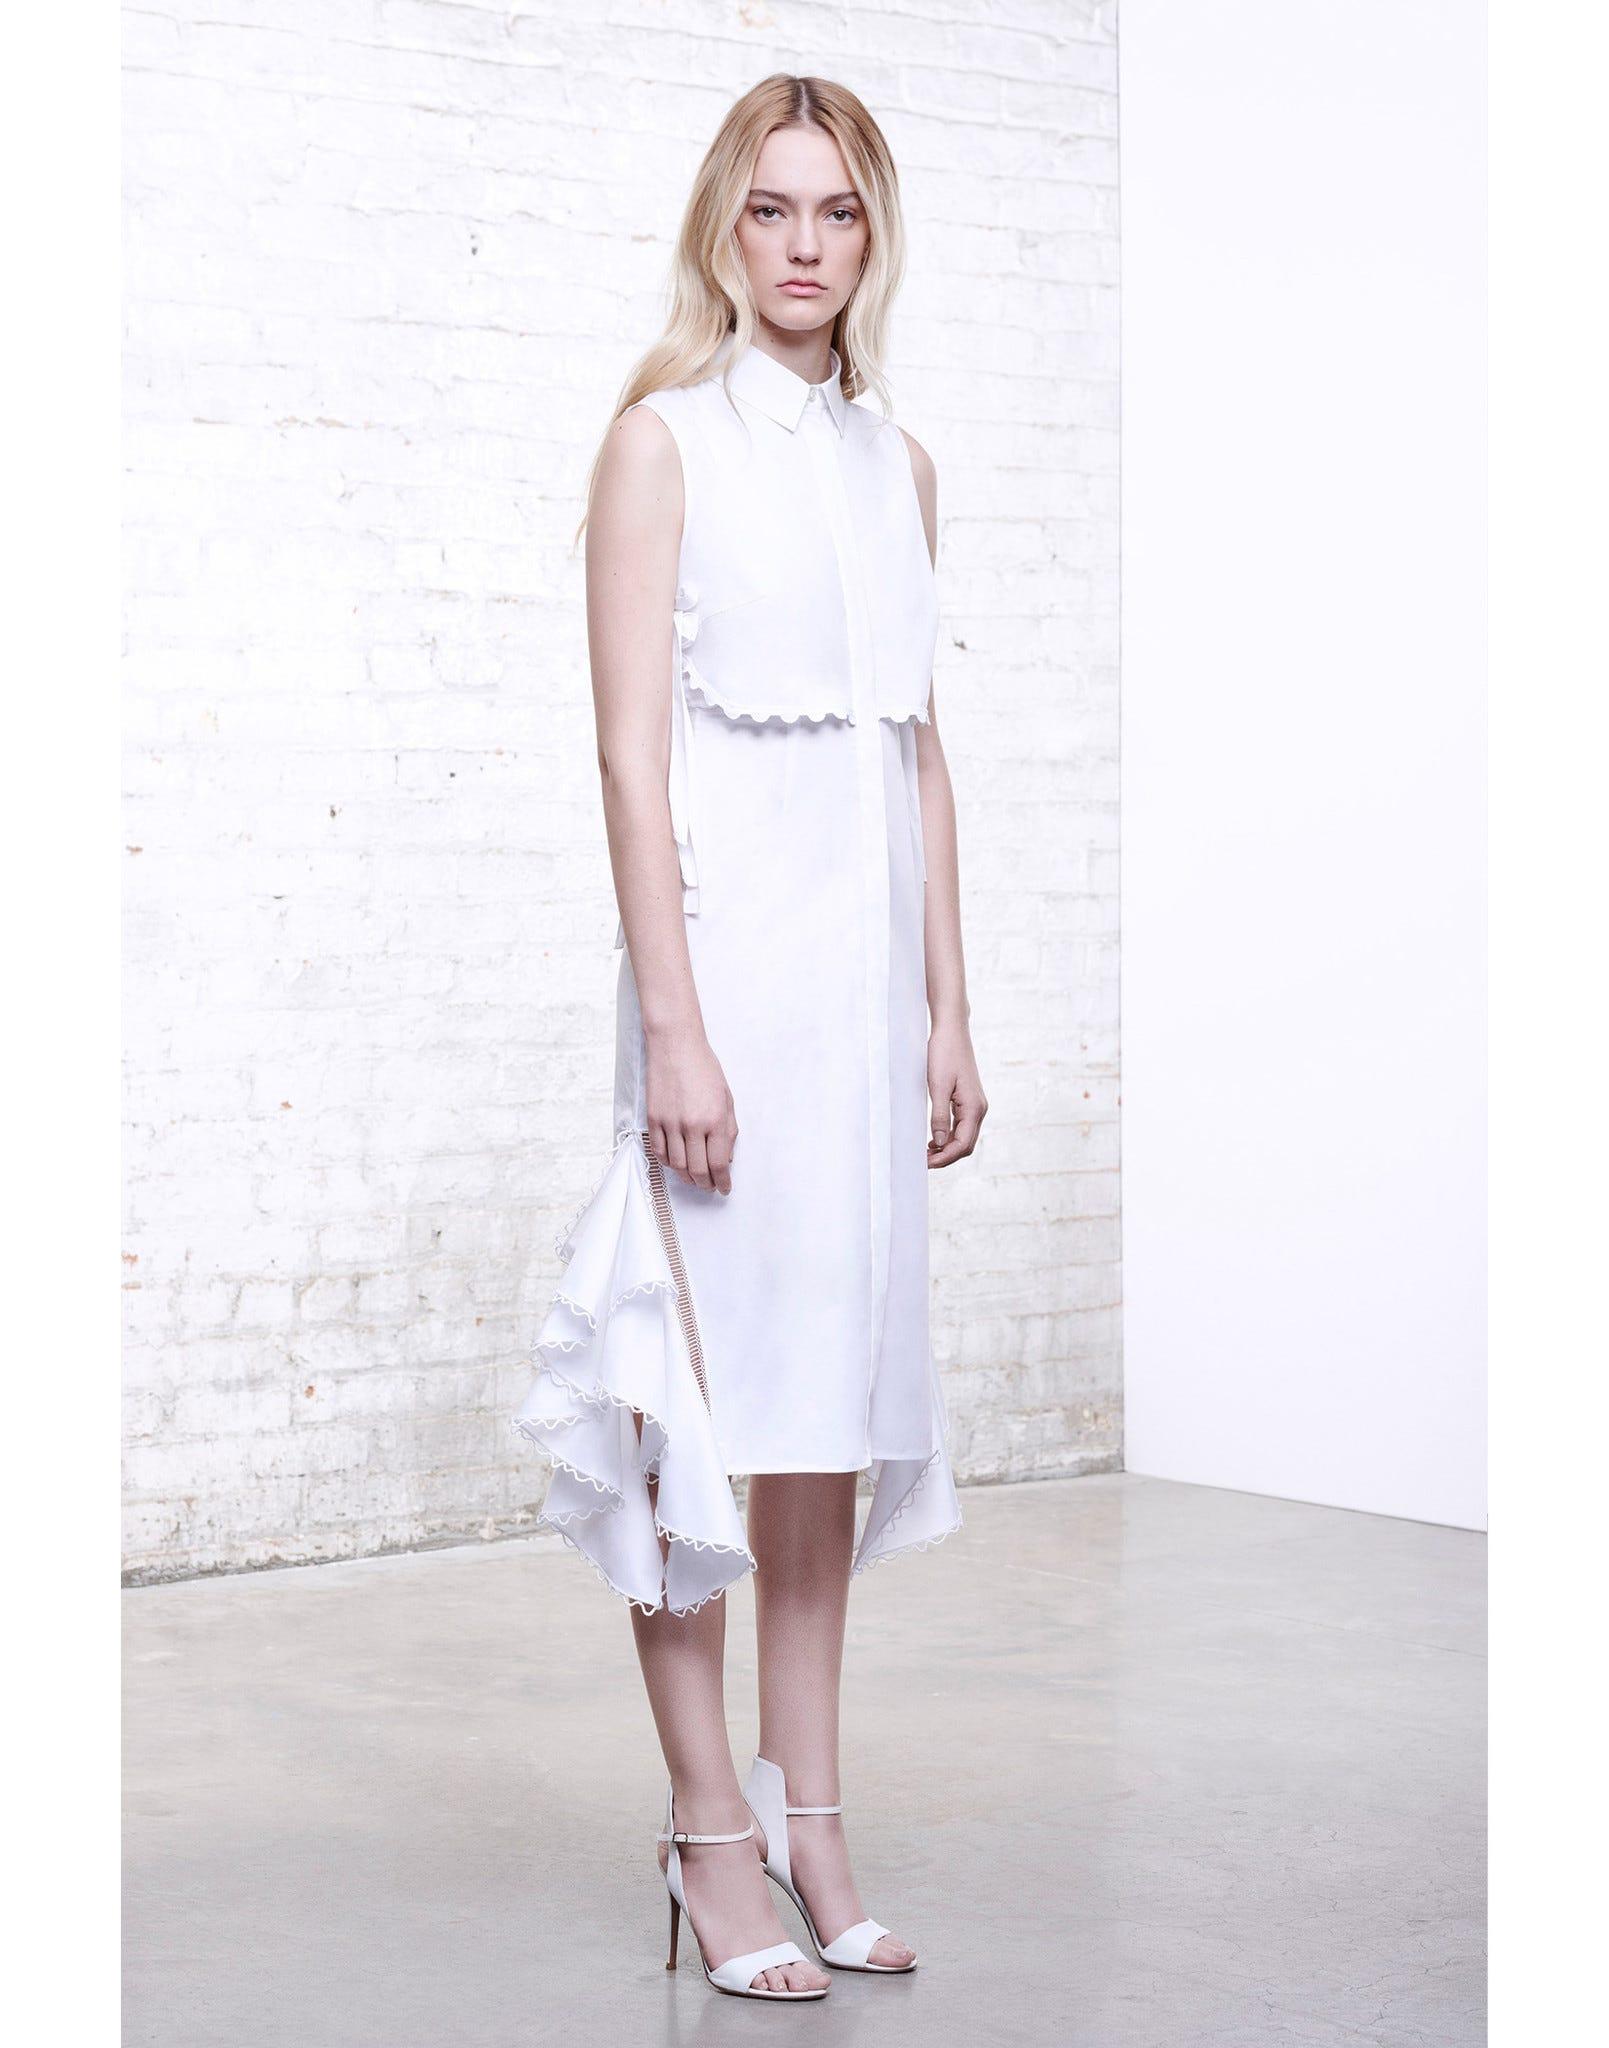 Under 1000 Dollar Wedding Dresses - Cheap Bridal Gowns